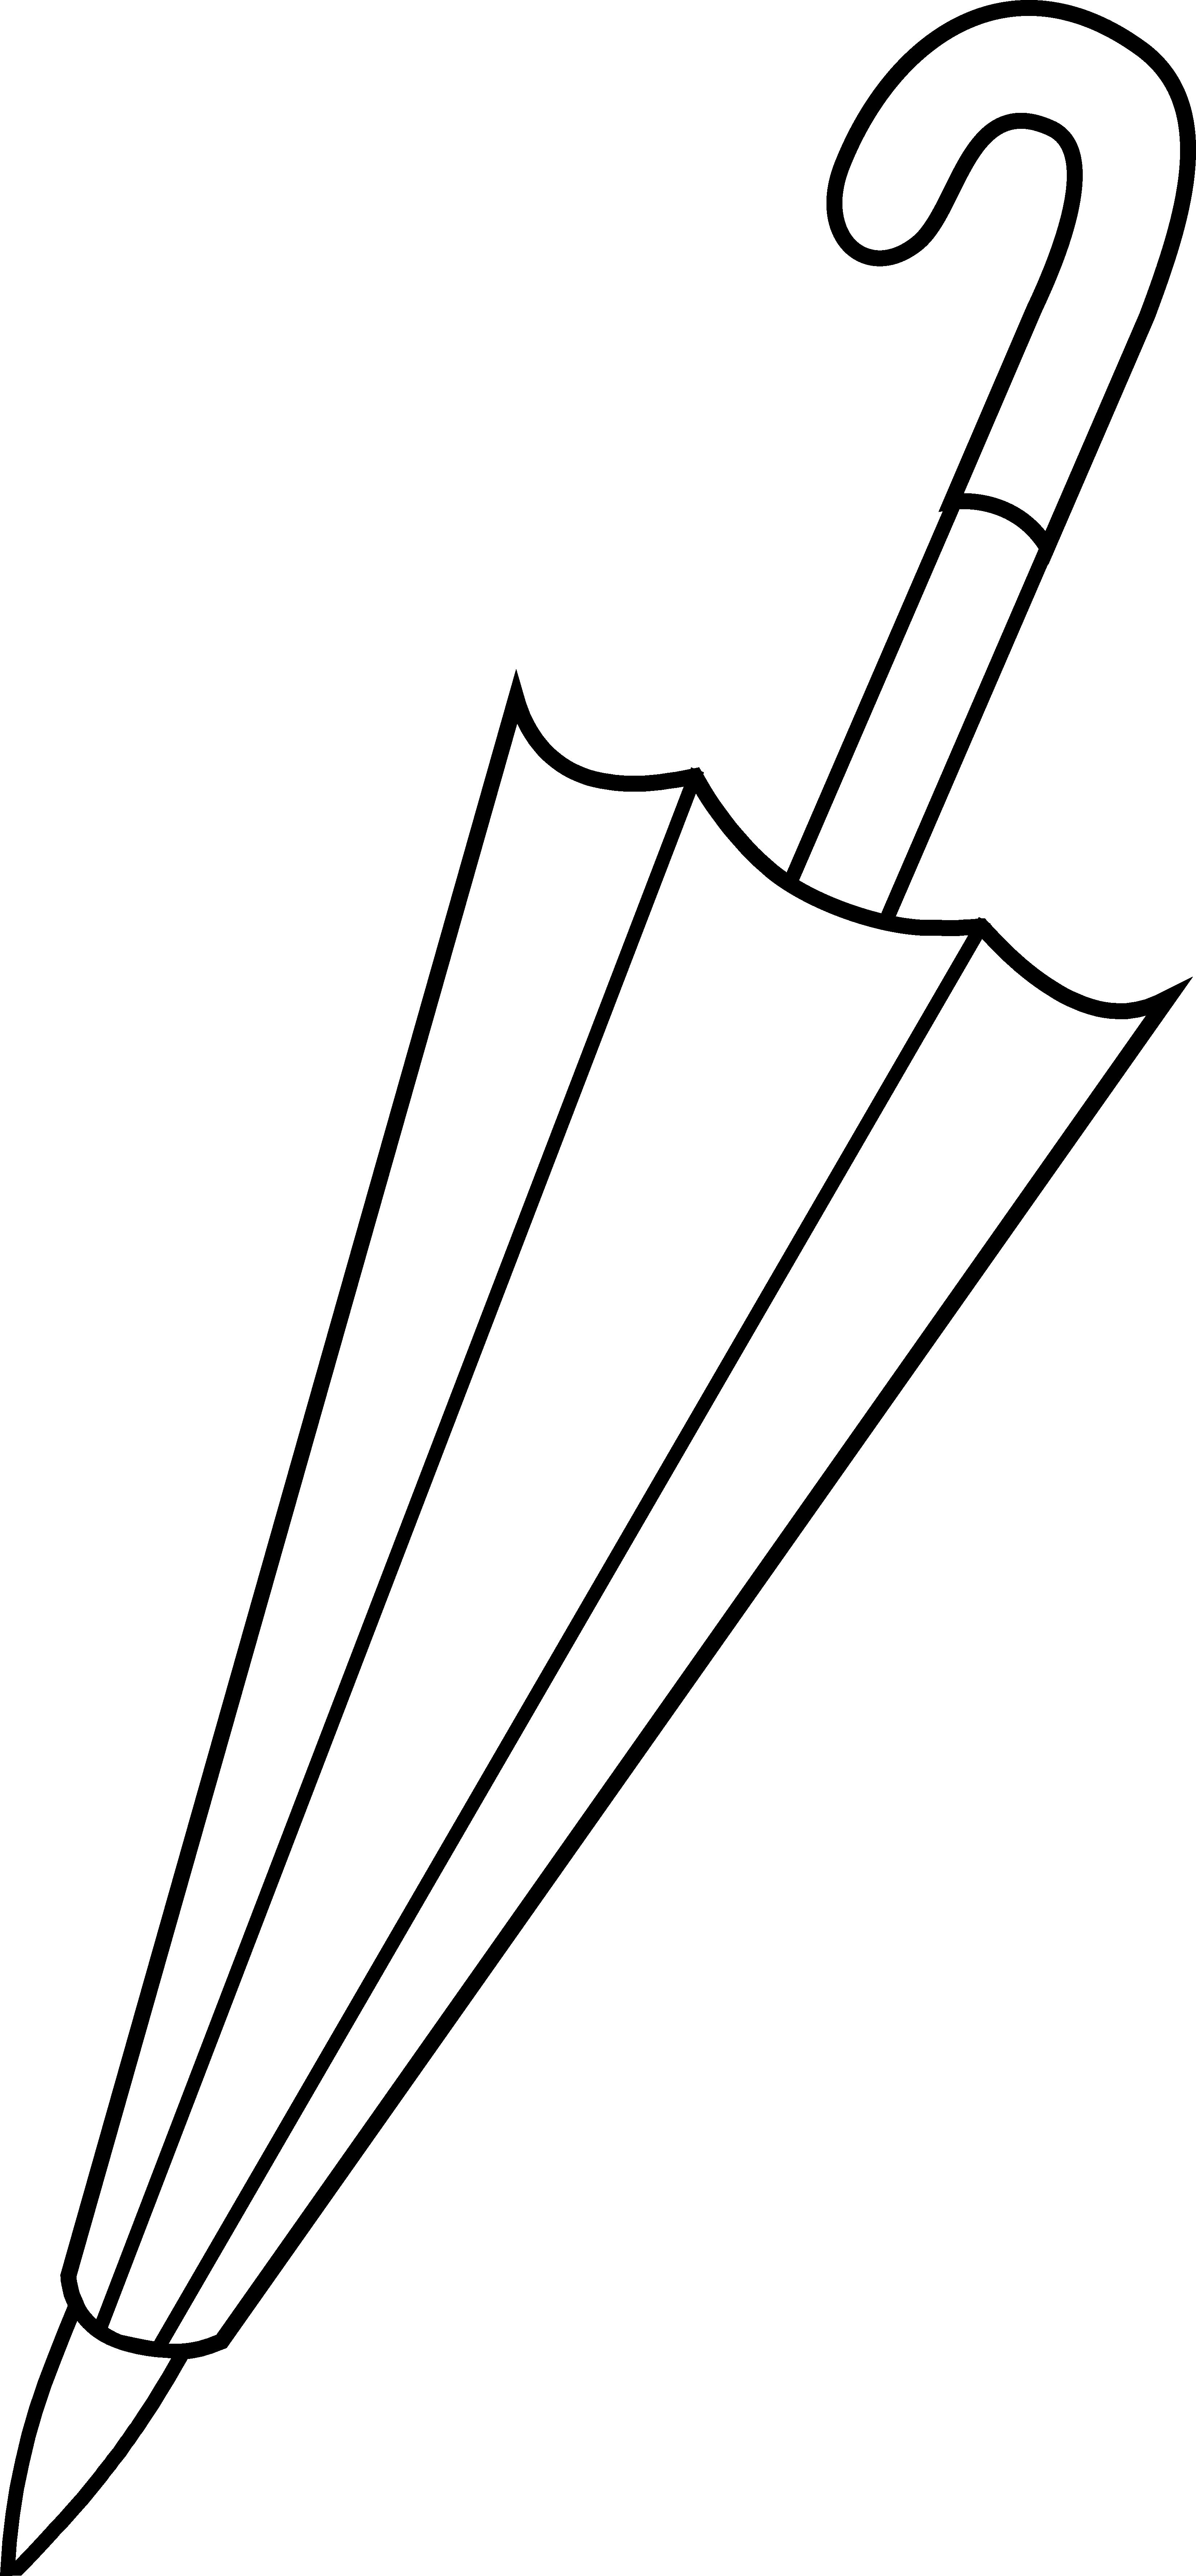 Line Art Umbrella : Umbrella clipart black and white panda free